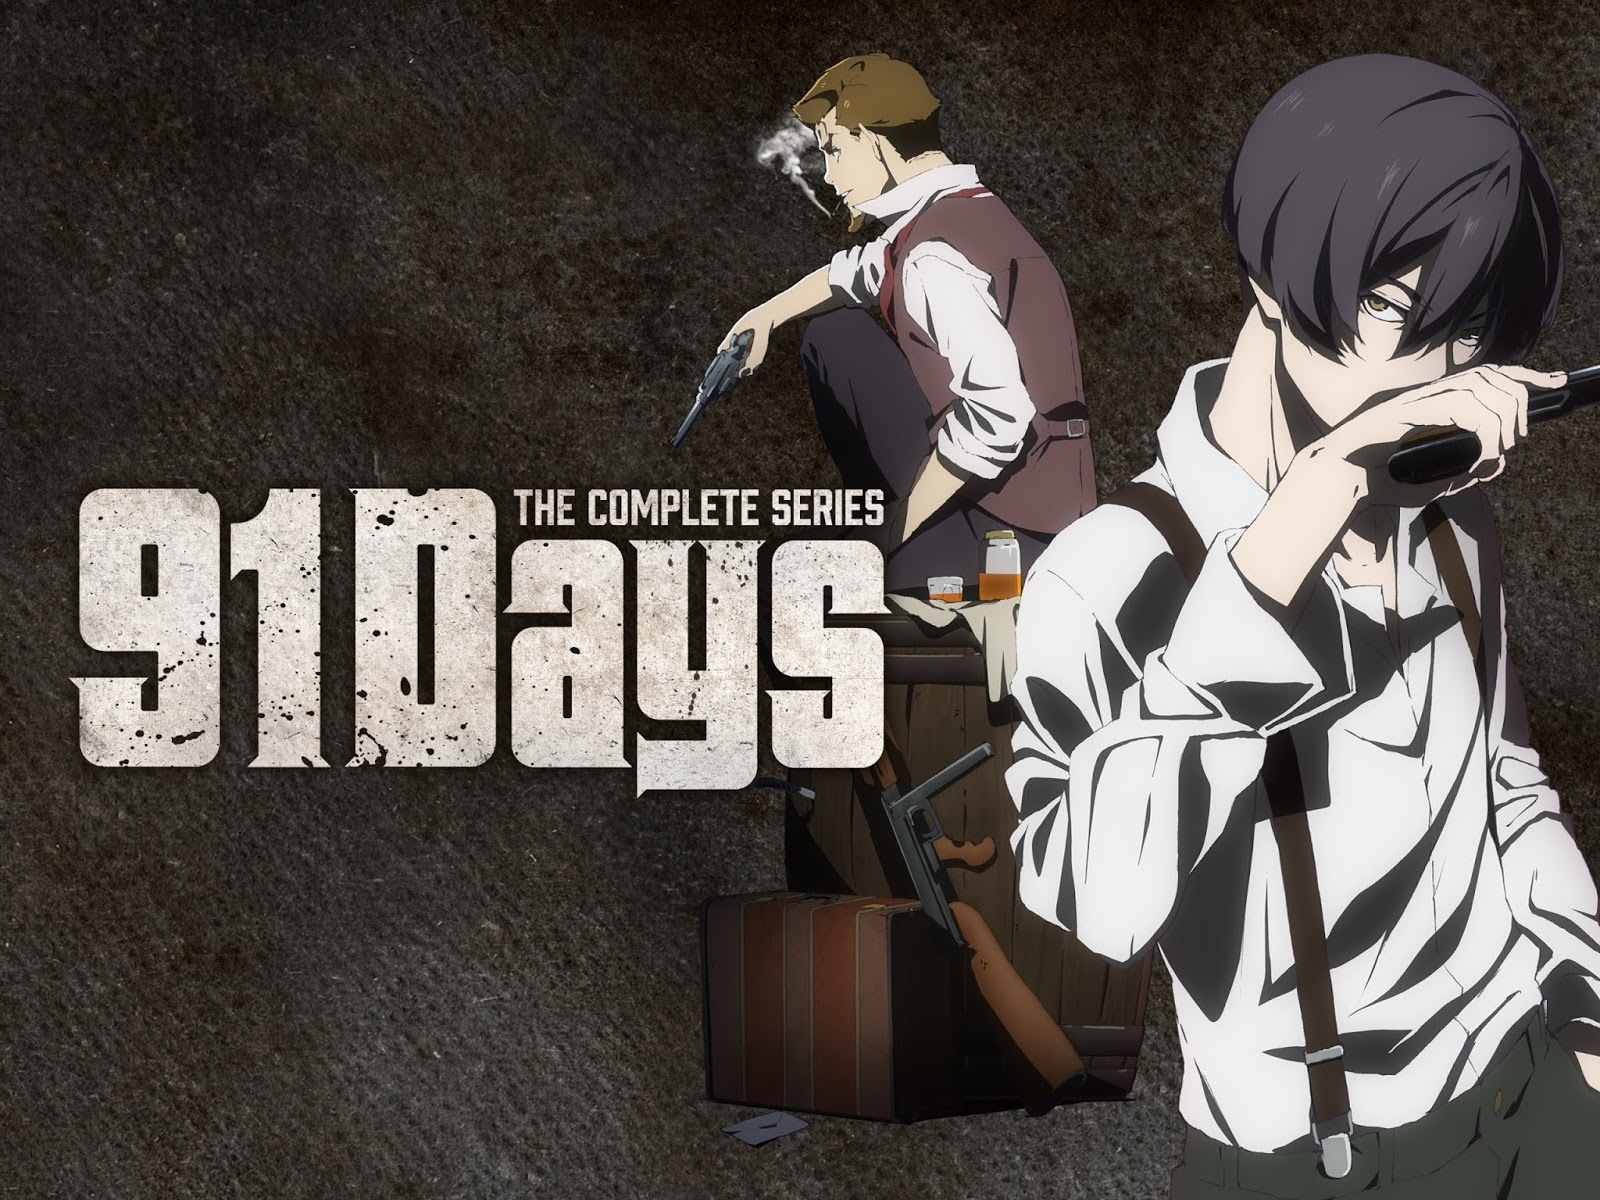 91 Days BD (Episode 01 - 12) Subtitle Indonesia + OVA